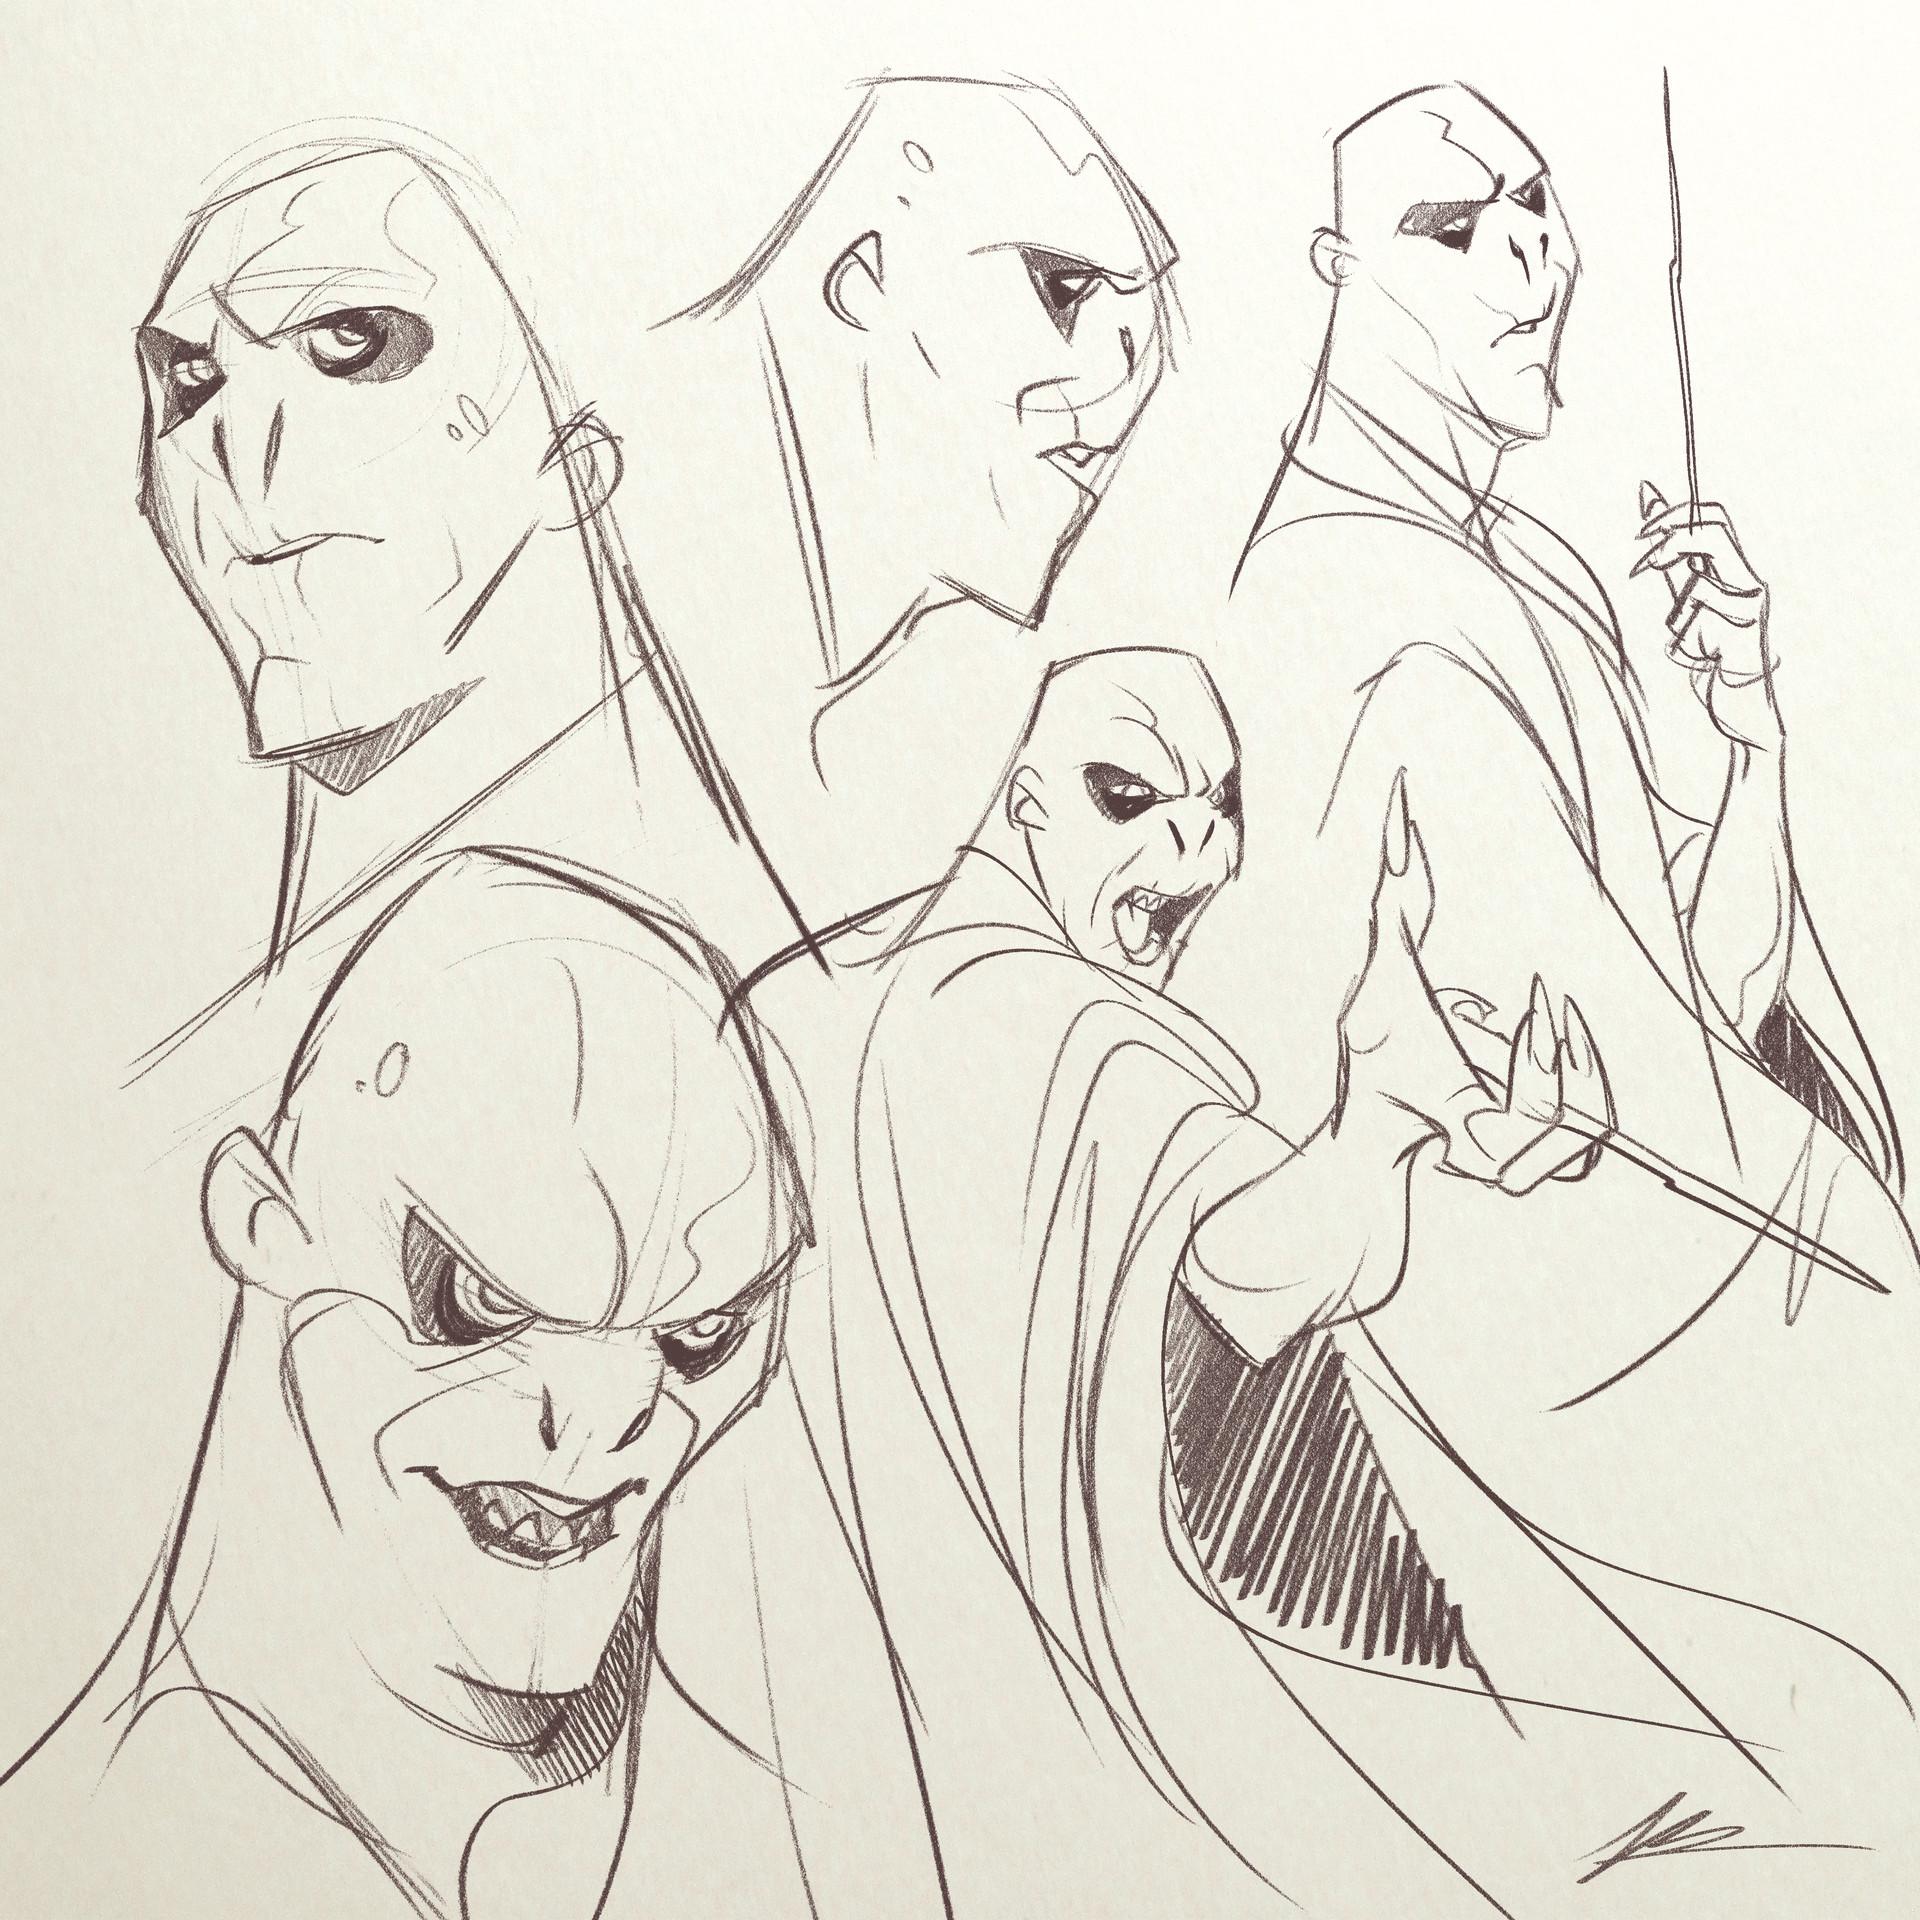 Valerio dreelrayk buonfantino voldemort sketches